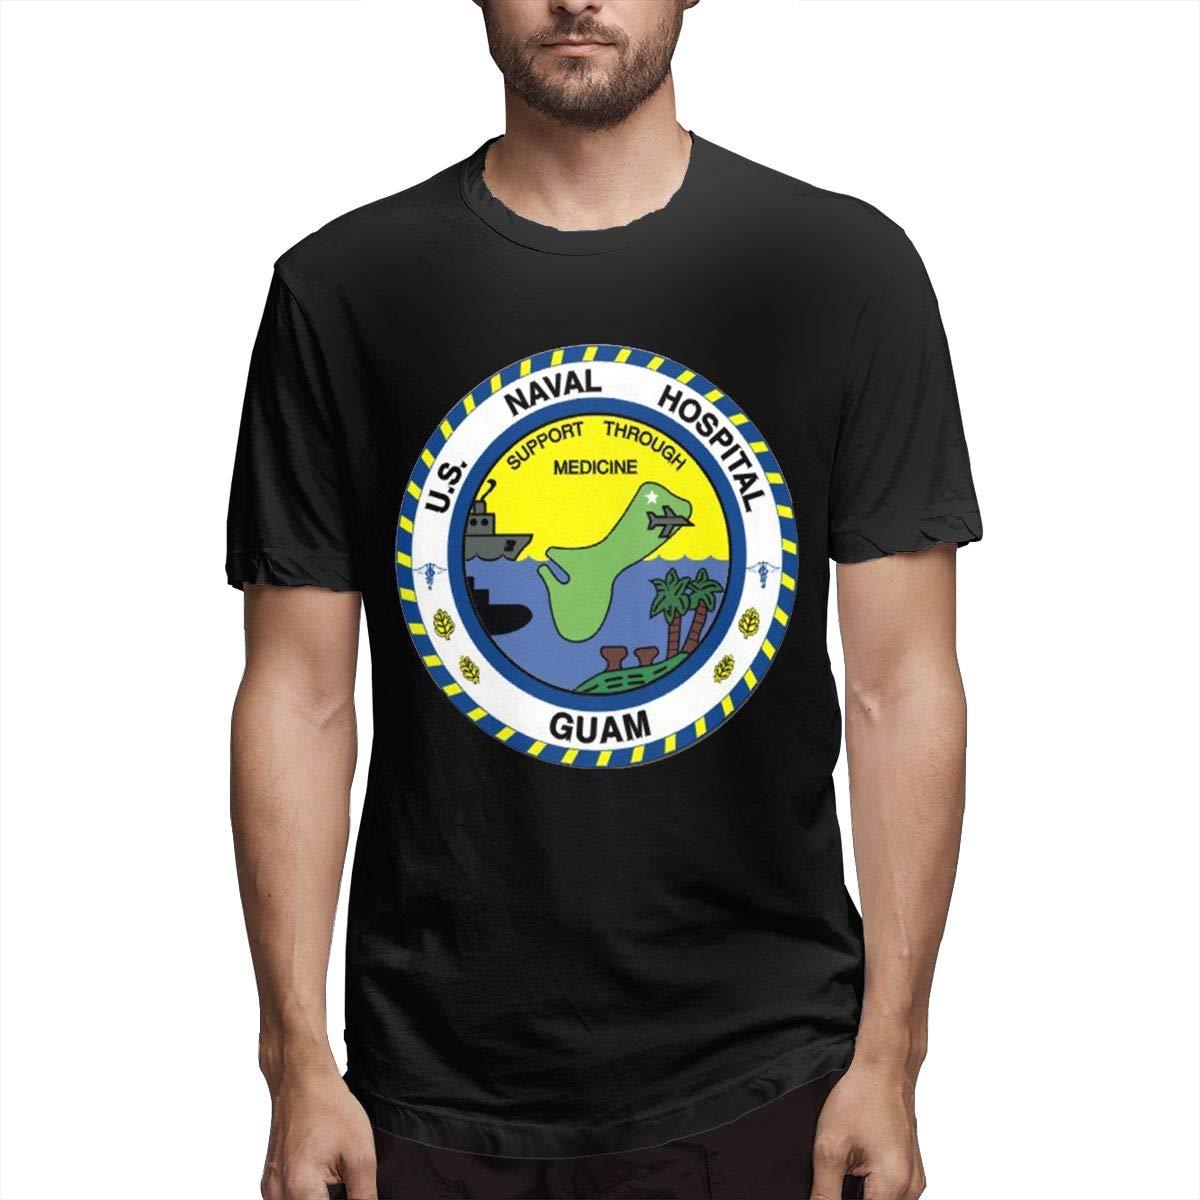 Dahwy Guam Naval Hospital Vinyl Transfer Fashion S T-shirt